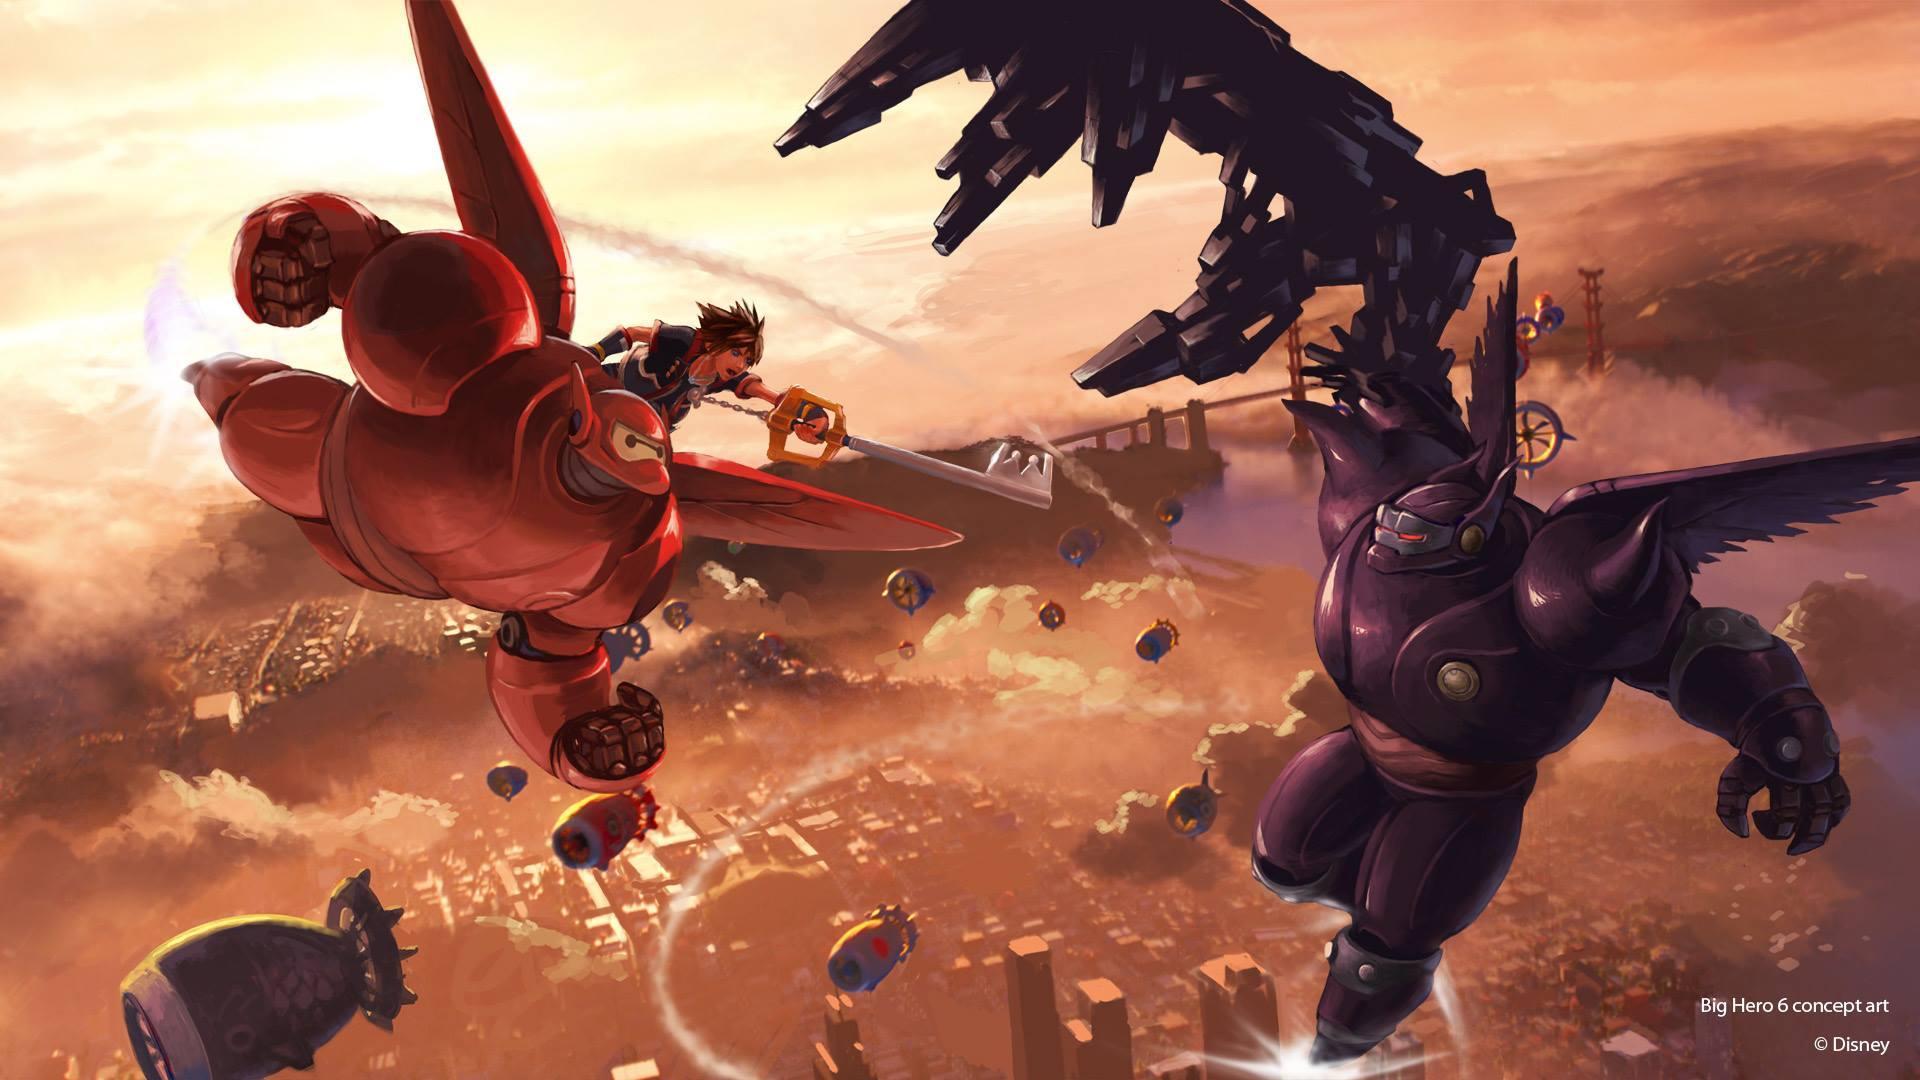 Kingdom Hearts 3 - Big Hero 6 promo